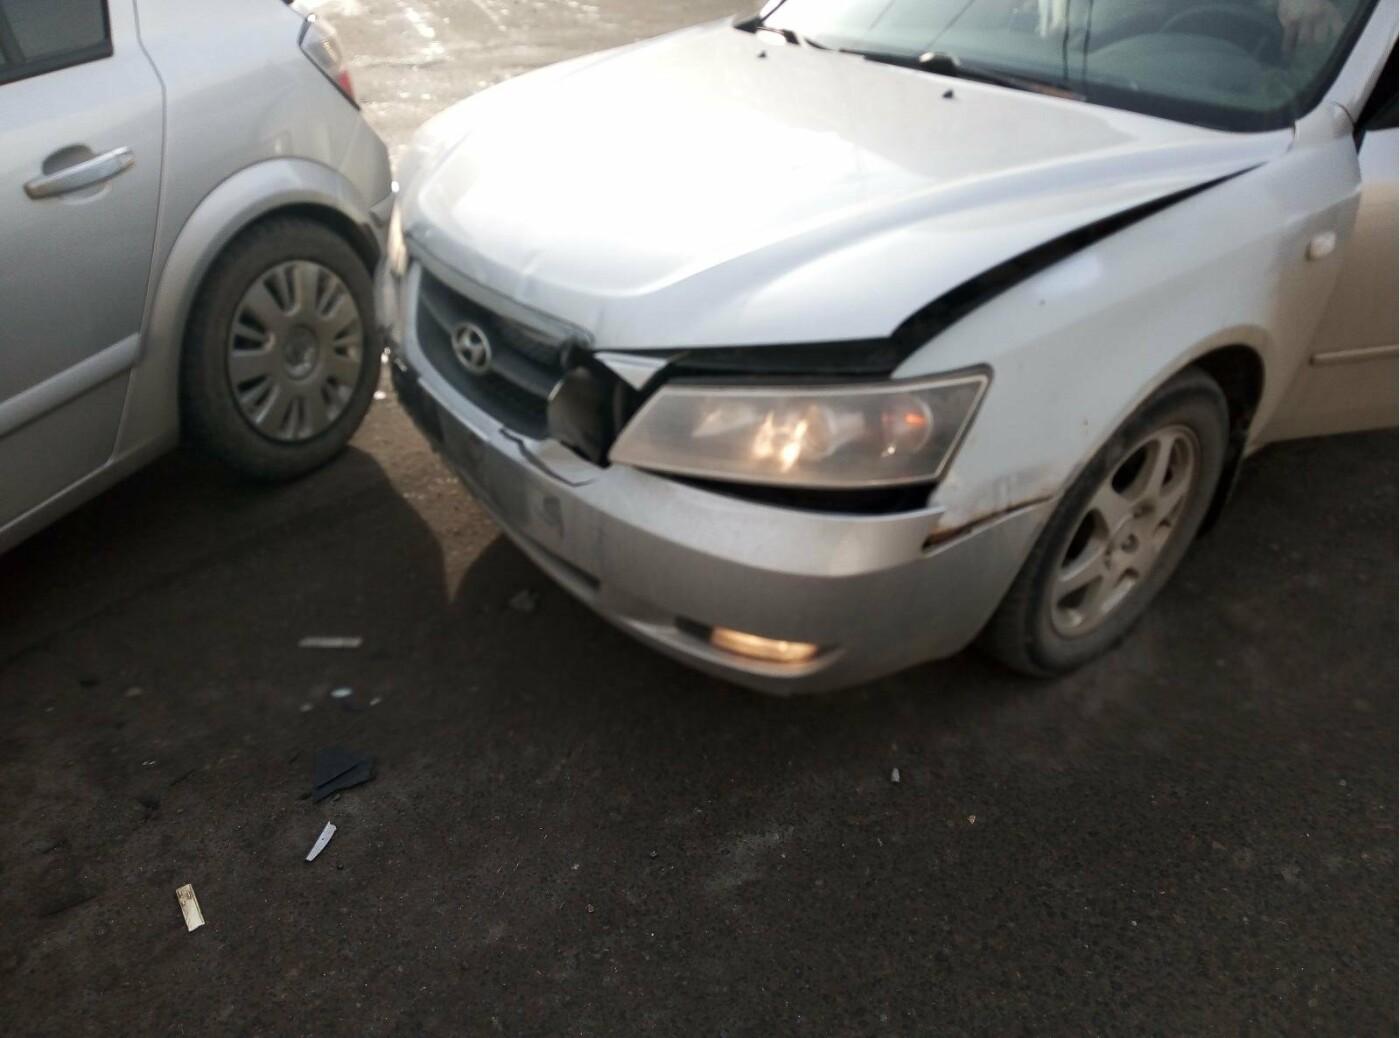 На севере Тамбова при столкновении двух иномарок пострадала школьница, фото-1